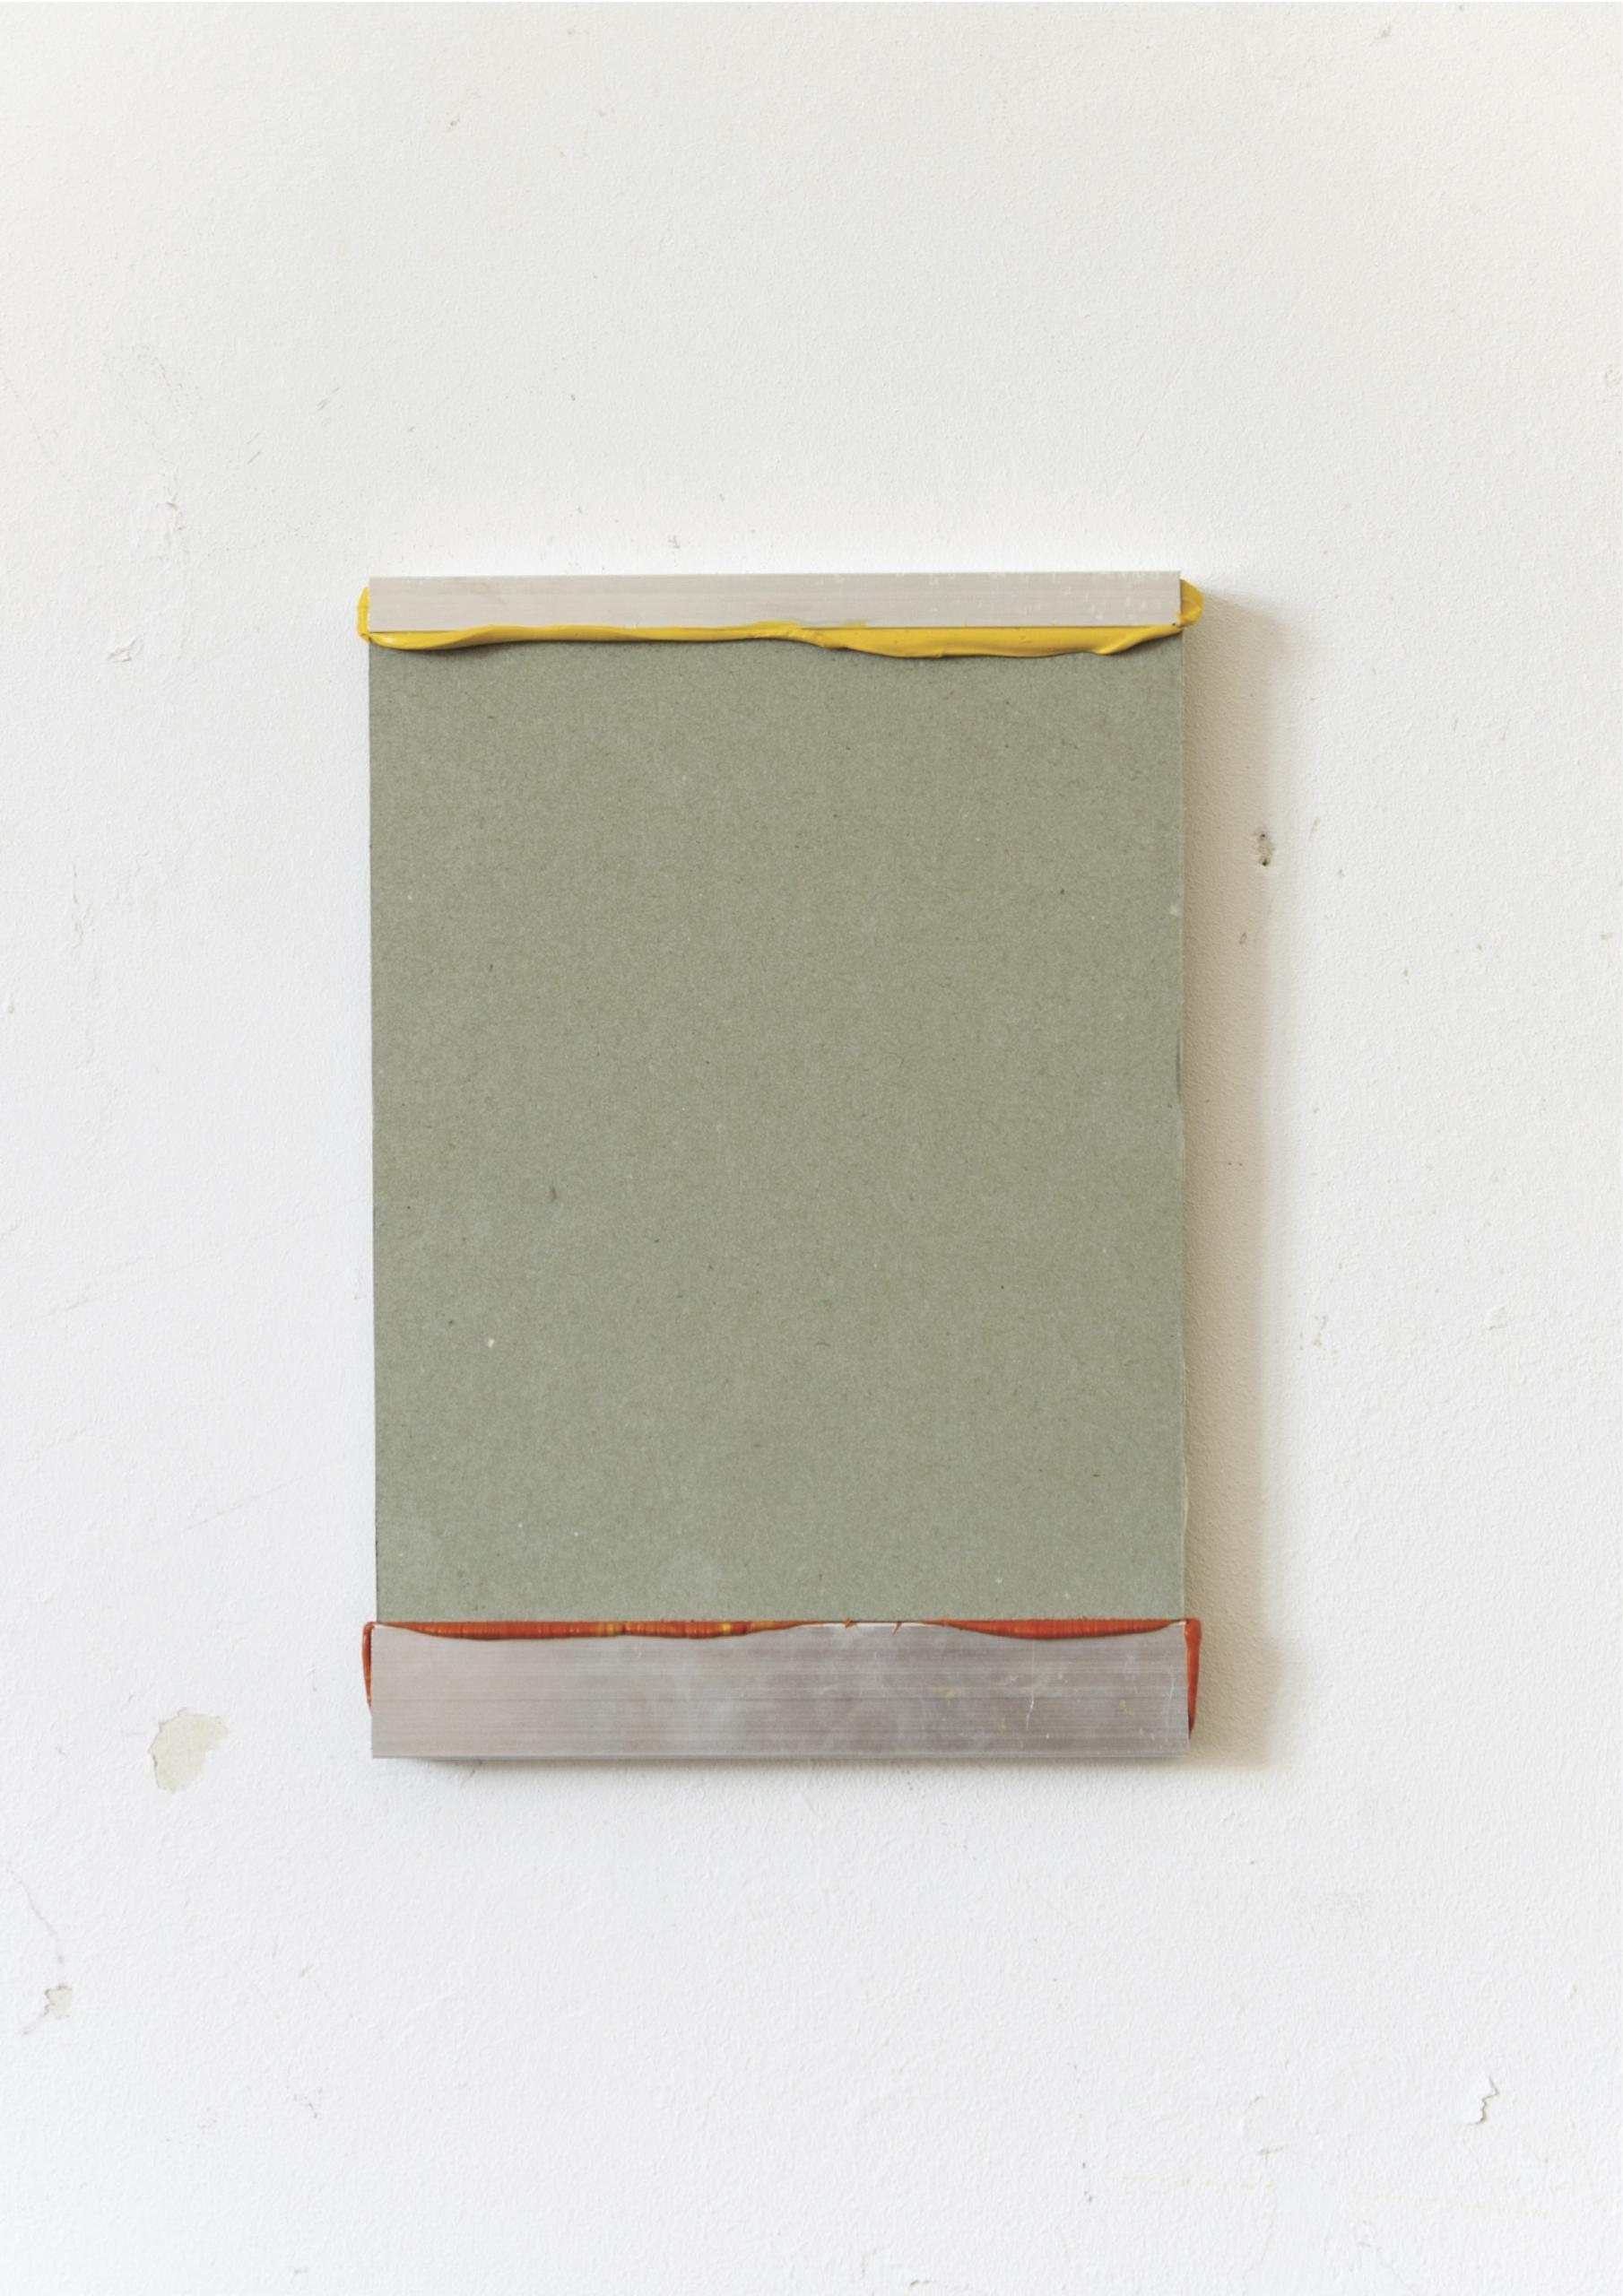 Kriz Olbricht, painting, 2016. Plasterboard, aluminum profiles, oil, silicone. 14,5 x 21 cm.